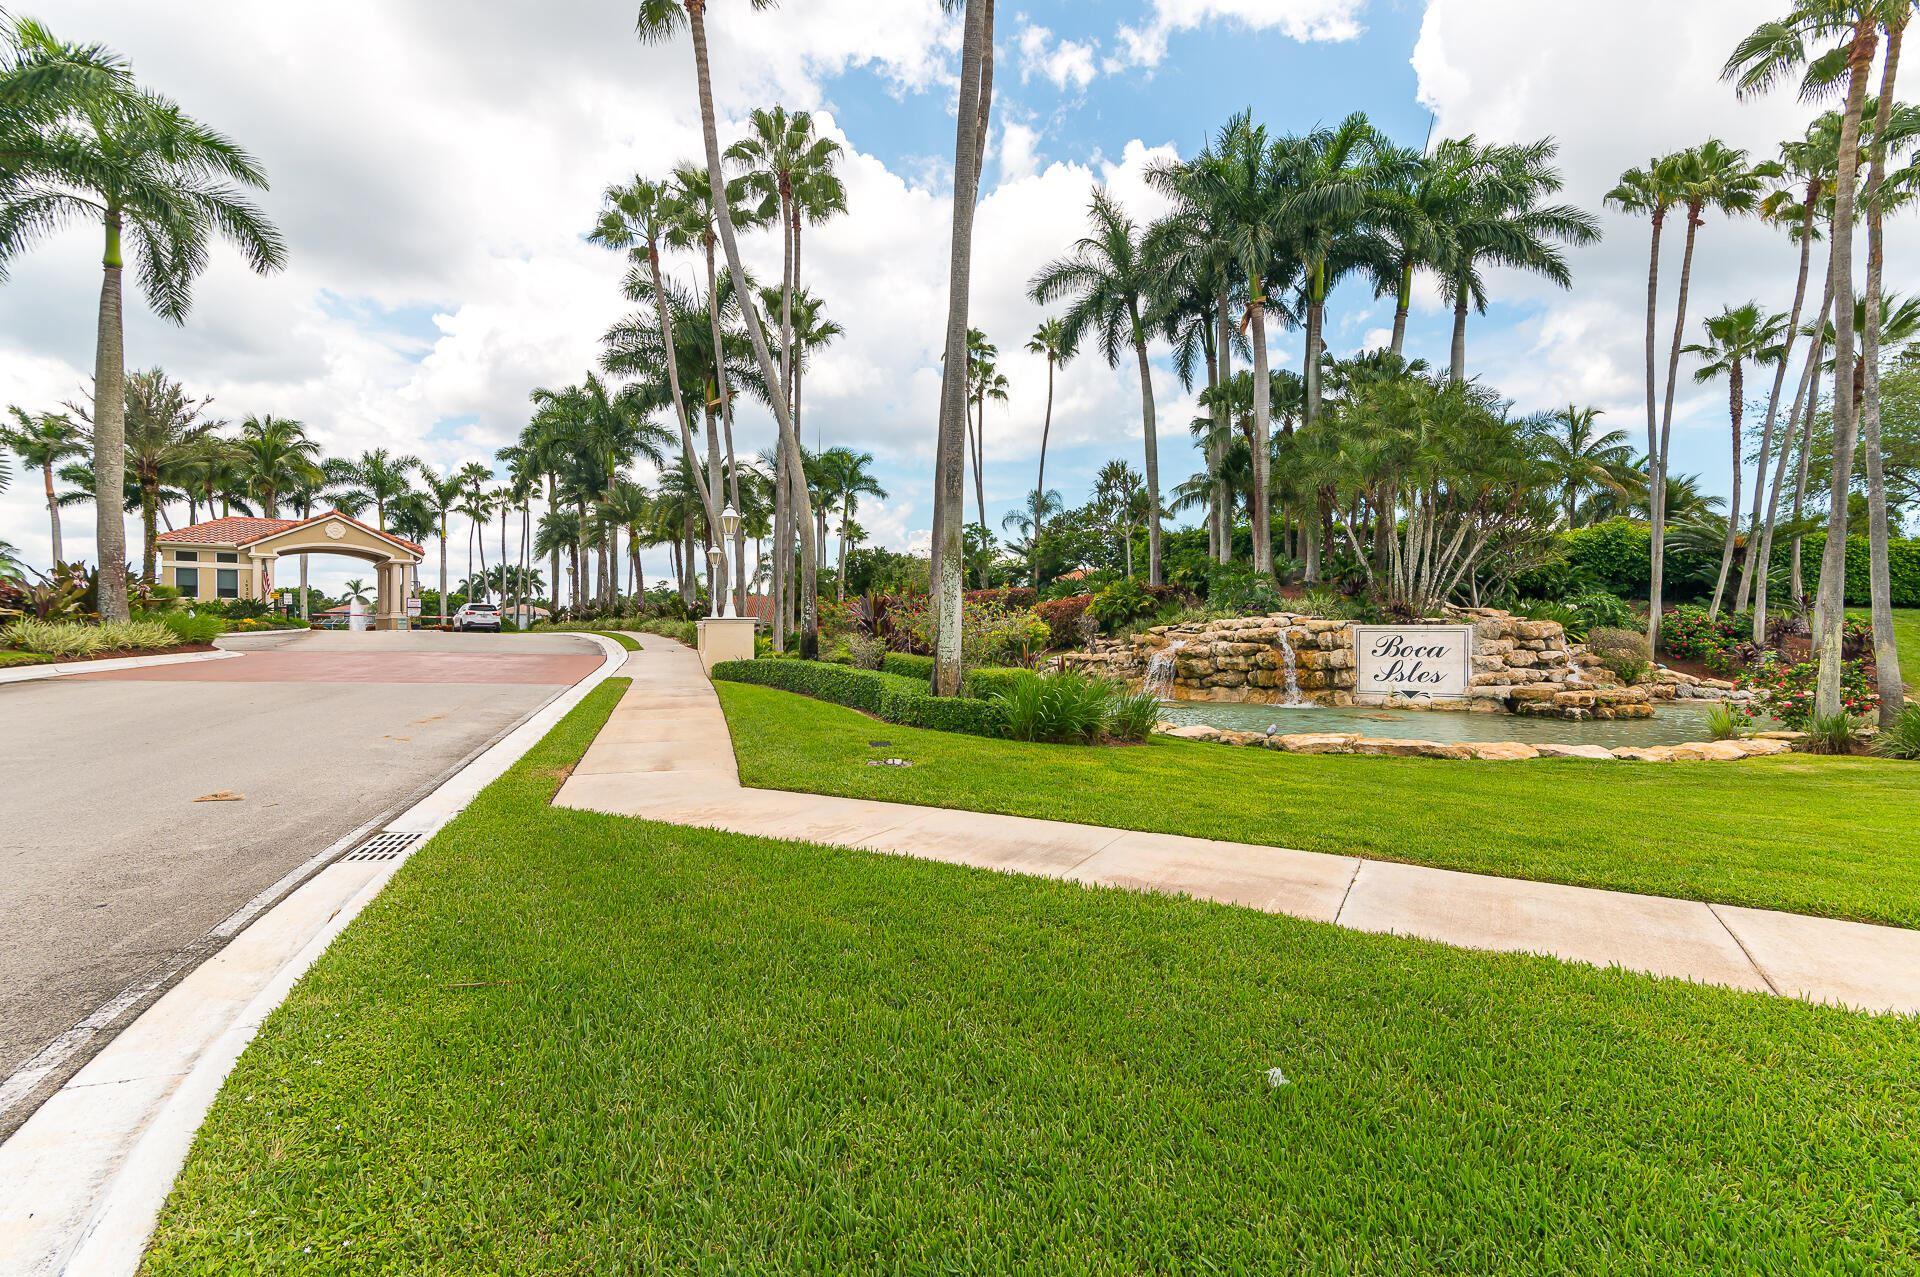 10728 Maple Chase Drive, Boca Raton, FL 33498 - MLS#: RX-10734818